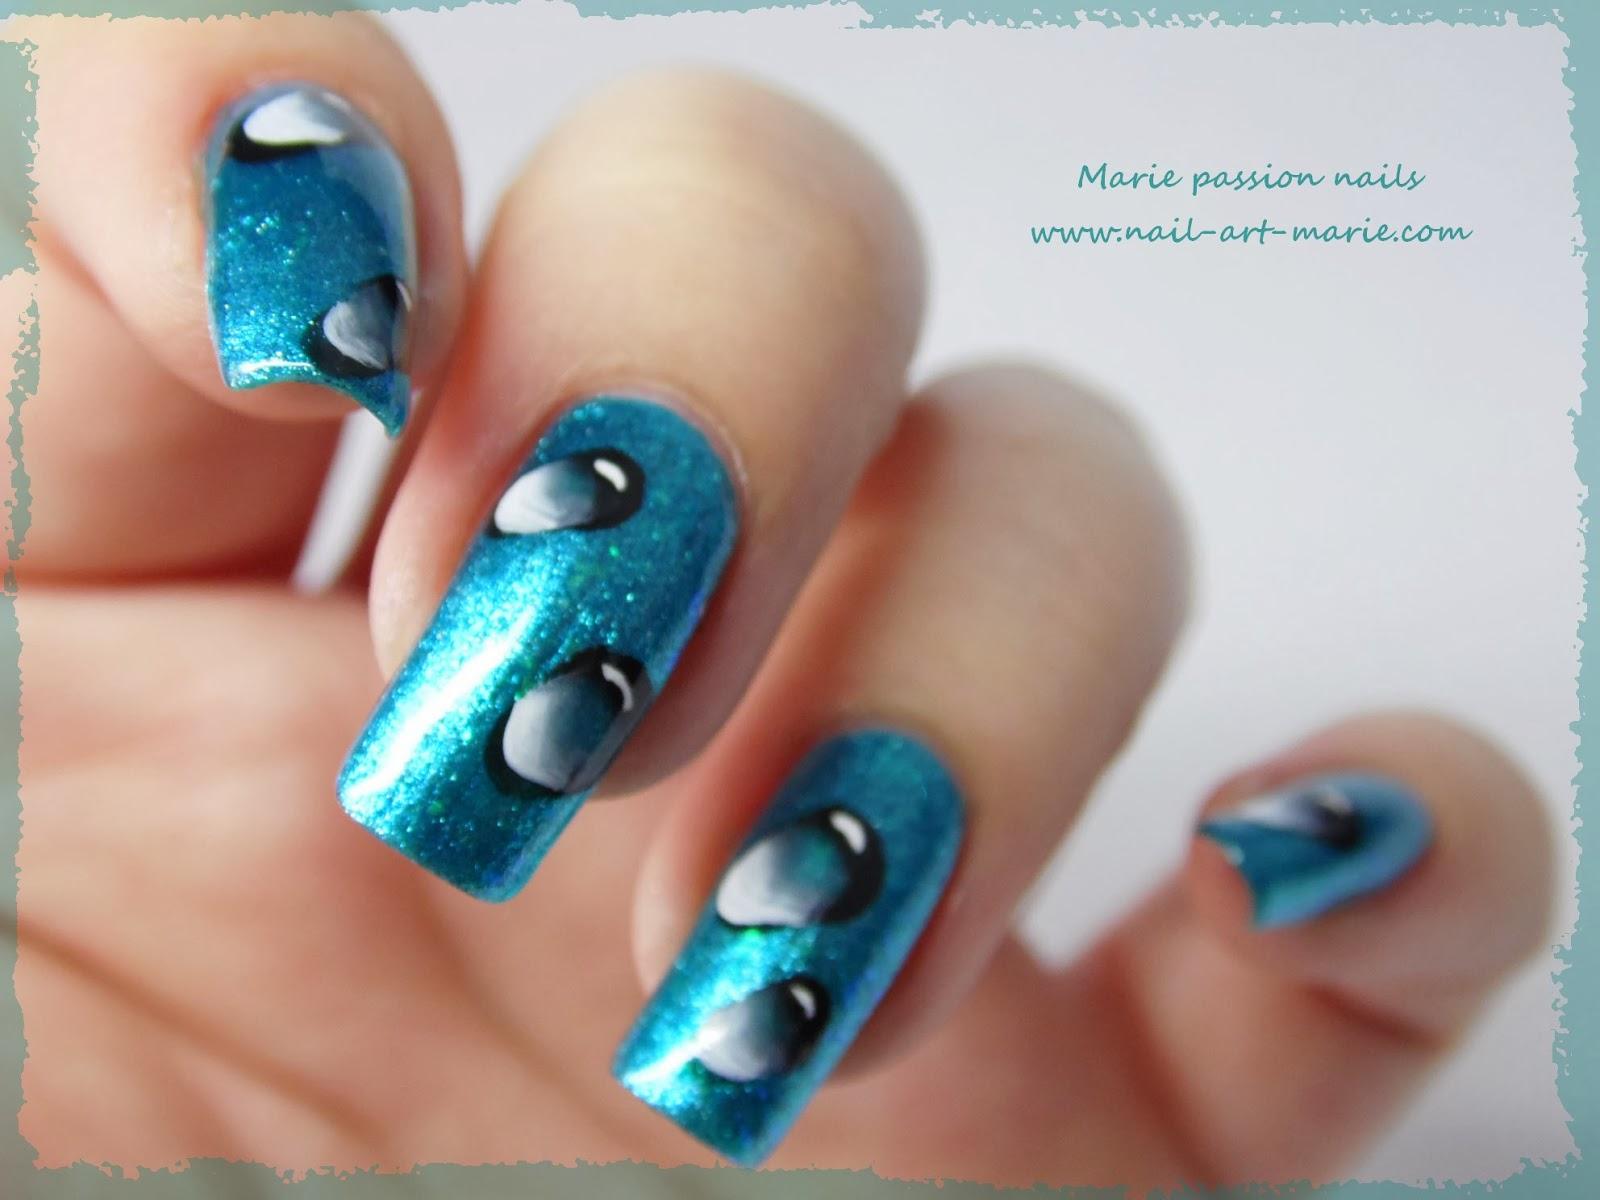 Nail Art gouttes d'eau en one stroke6